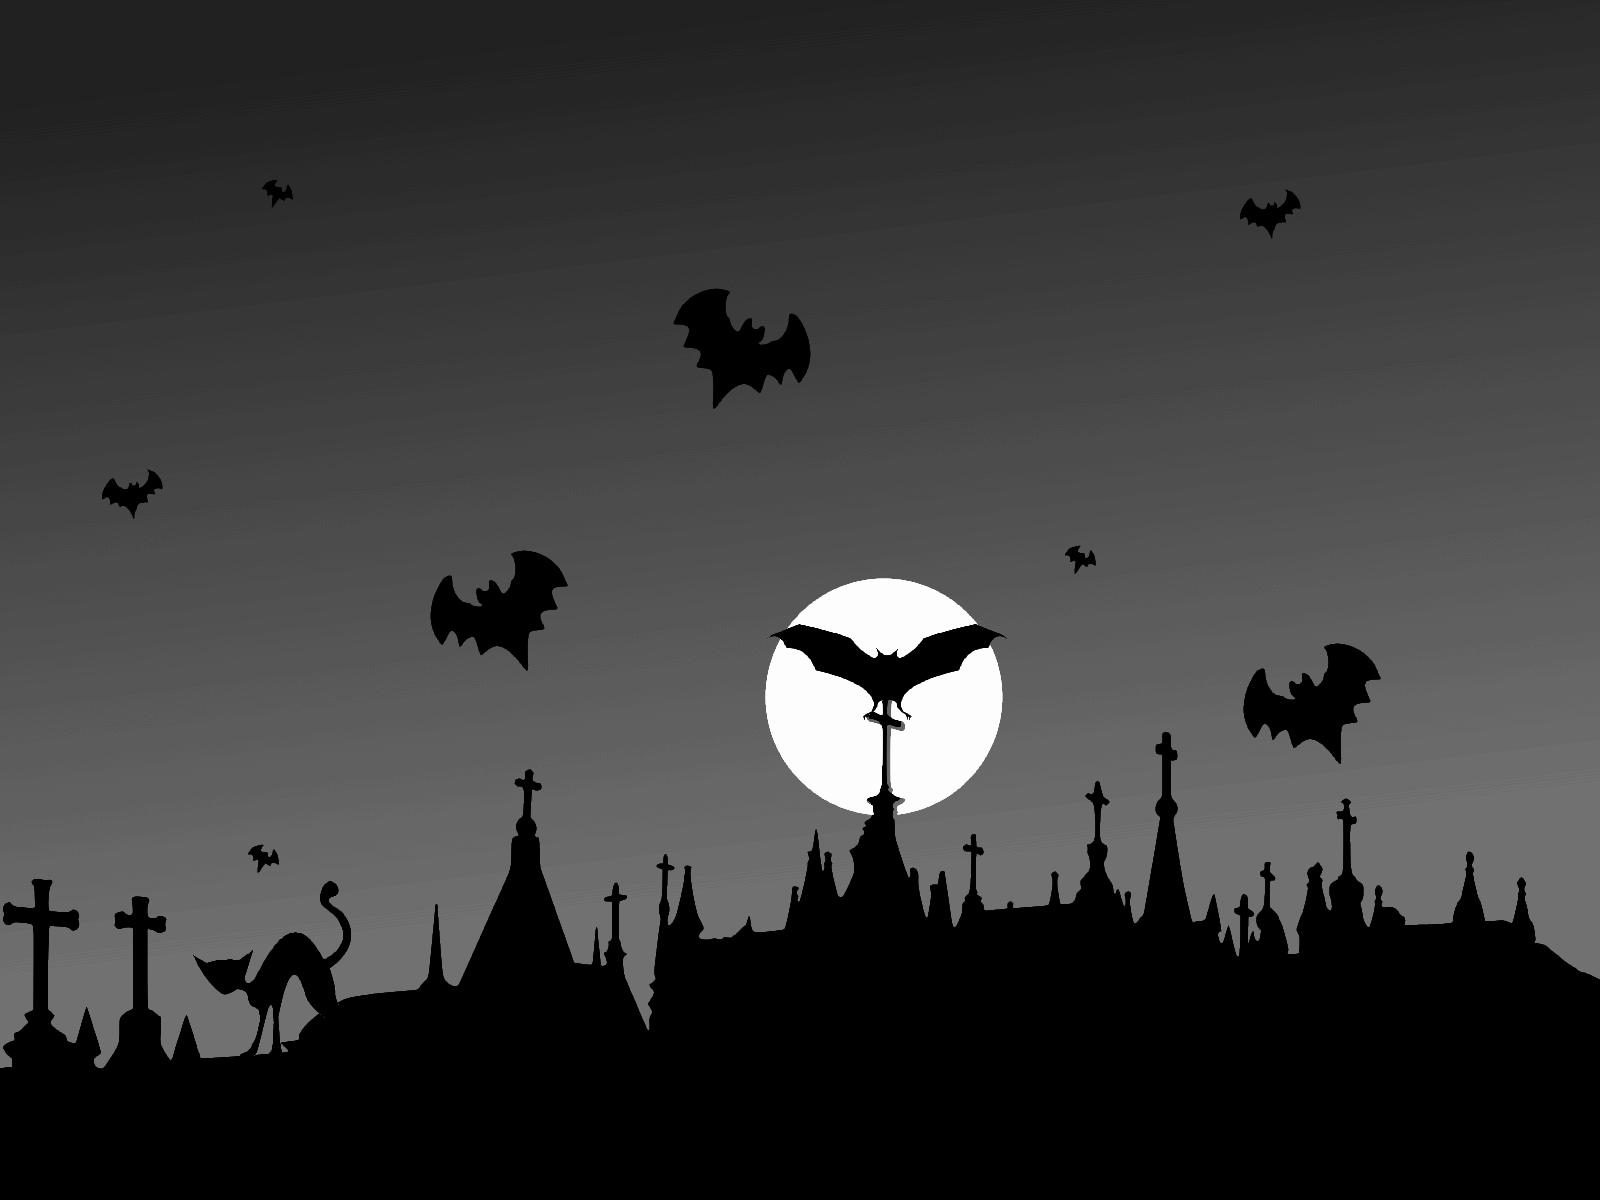 Download Wallpaper Halloween Pinterest - 1a507fdfad7f0136aa9304e9ba233404  Gallery_585819.png